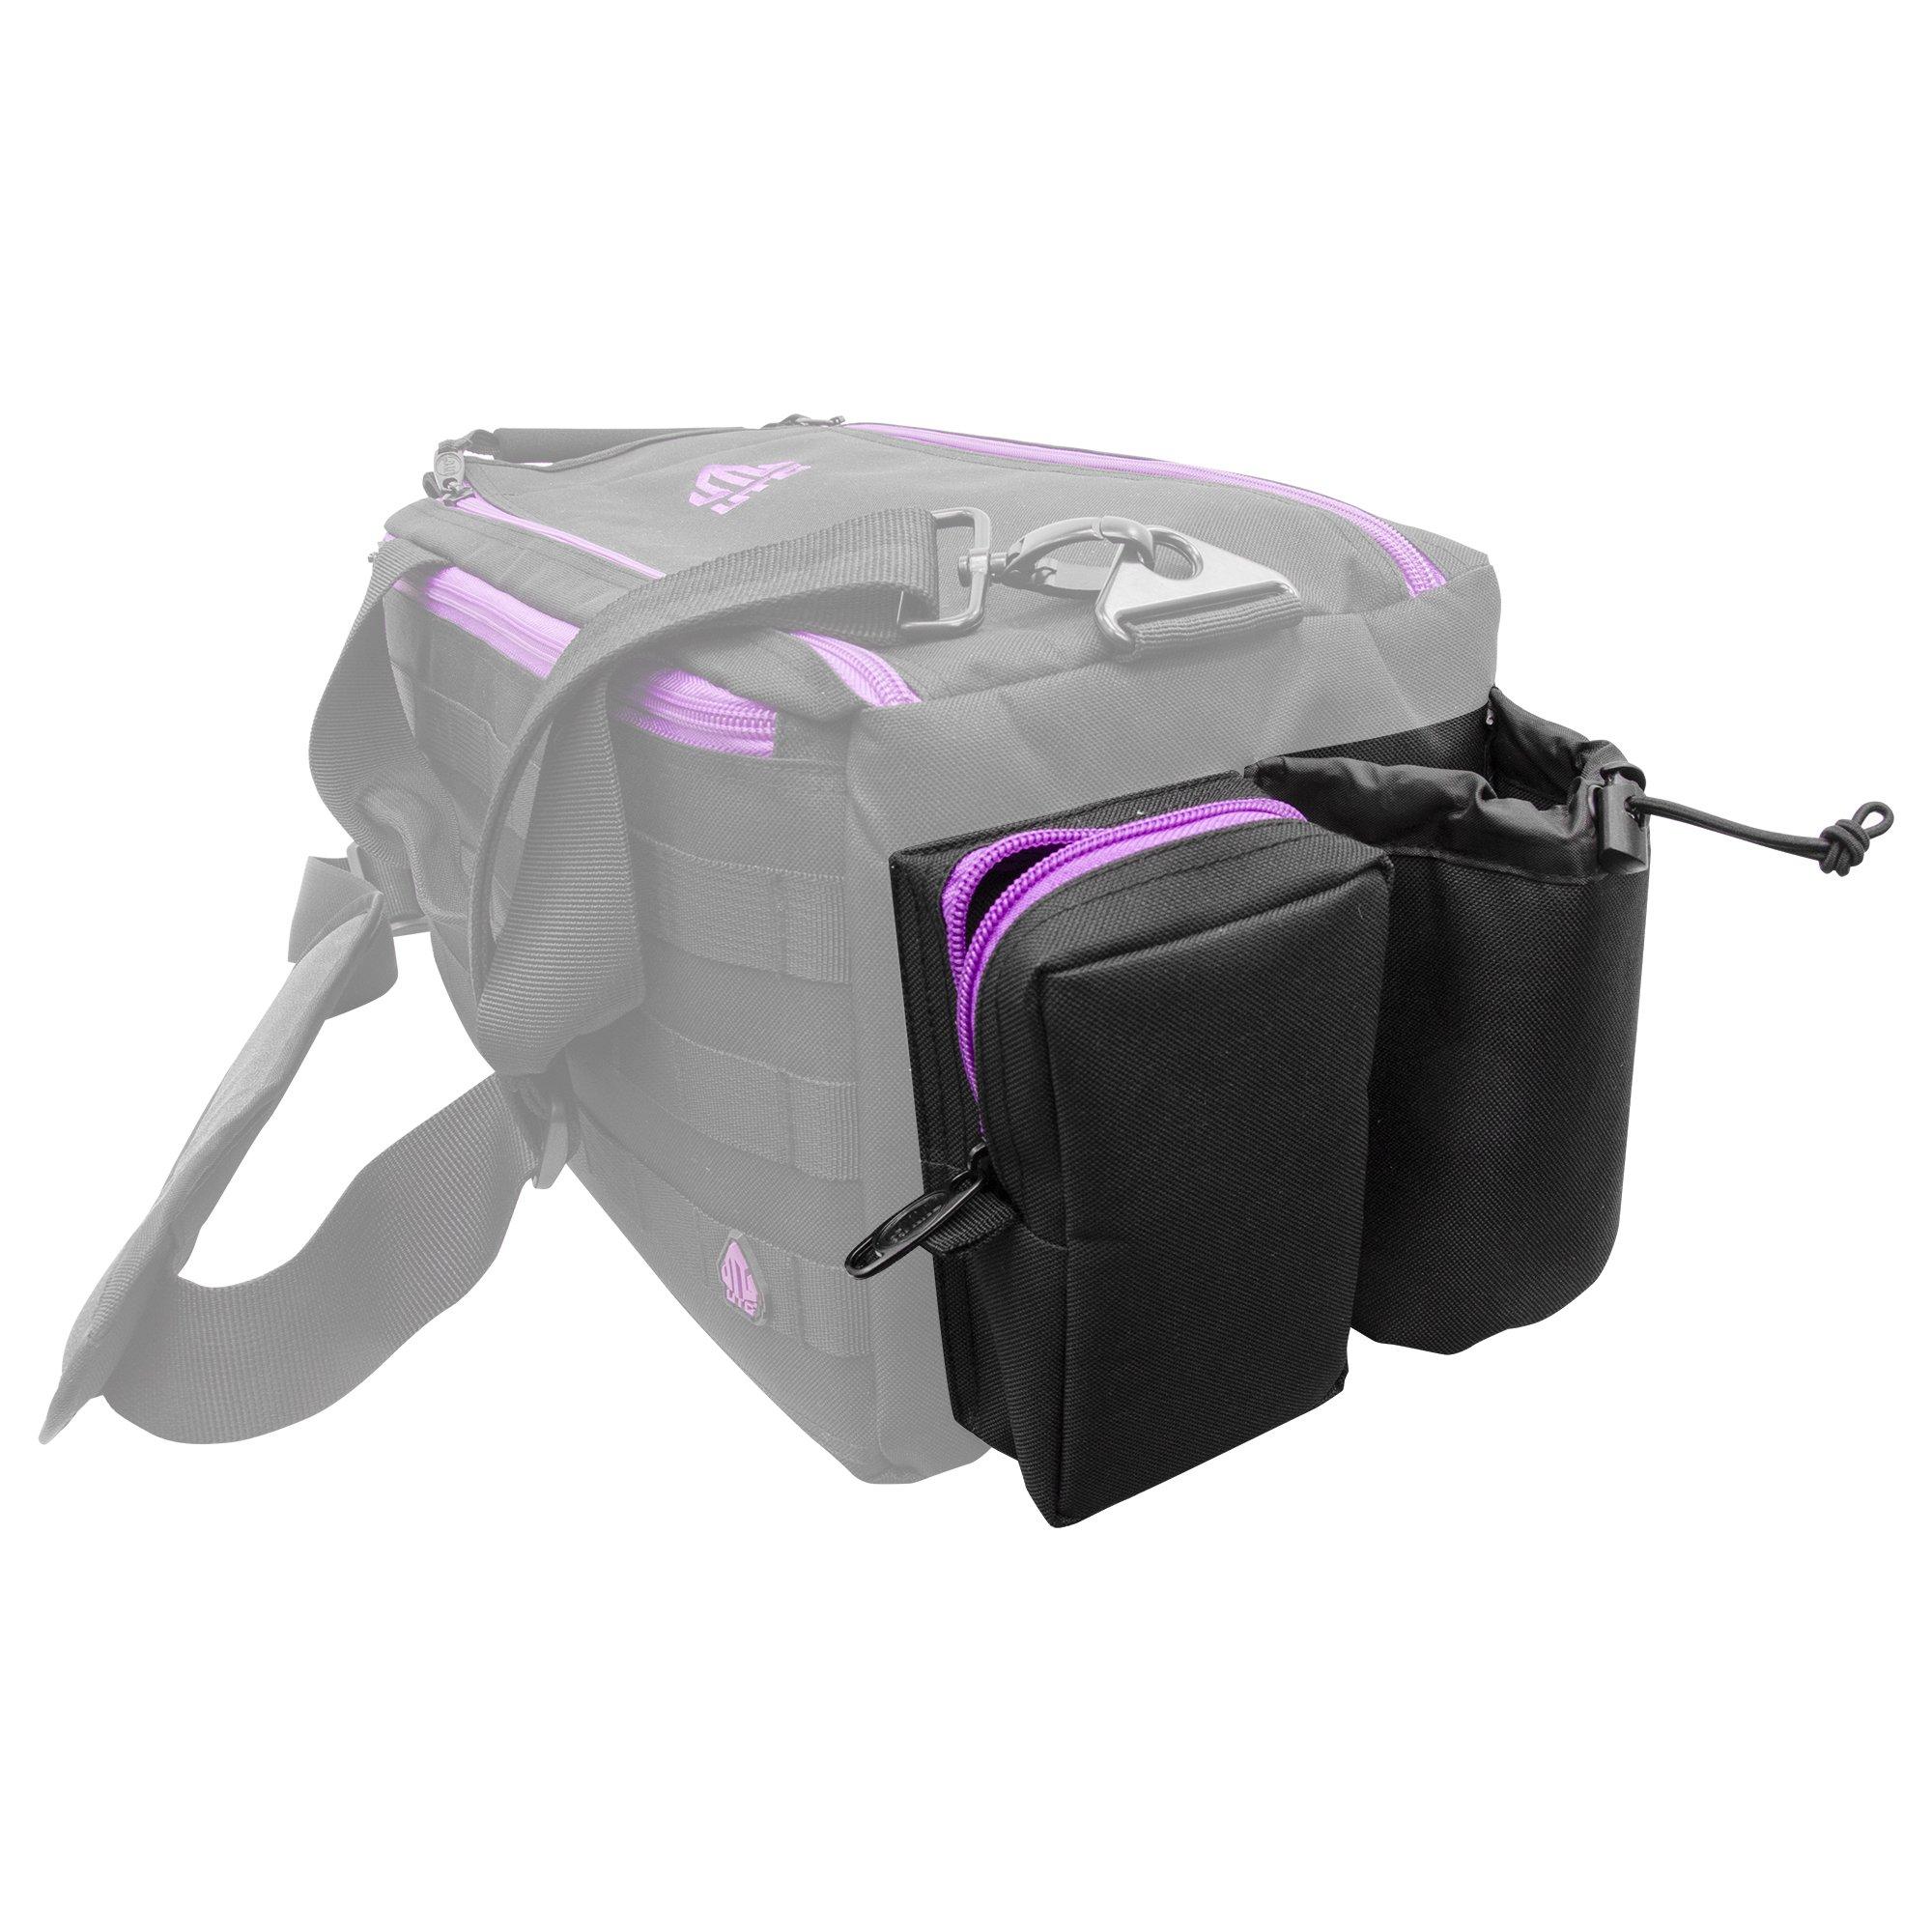 UTG All in One Range/Utility Go Bag, Black/Violet, 21'' x 10'' x 9'' by UTG (Image #5)